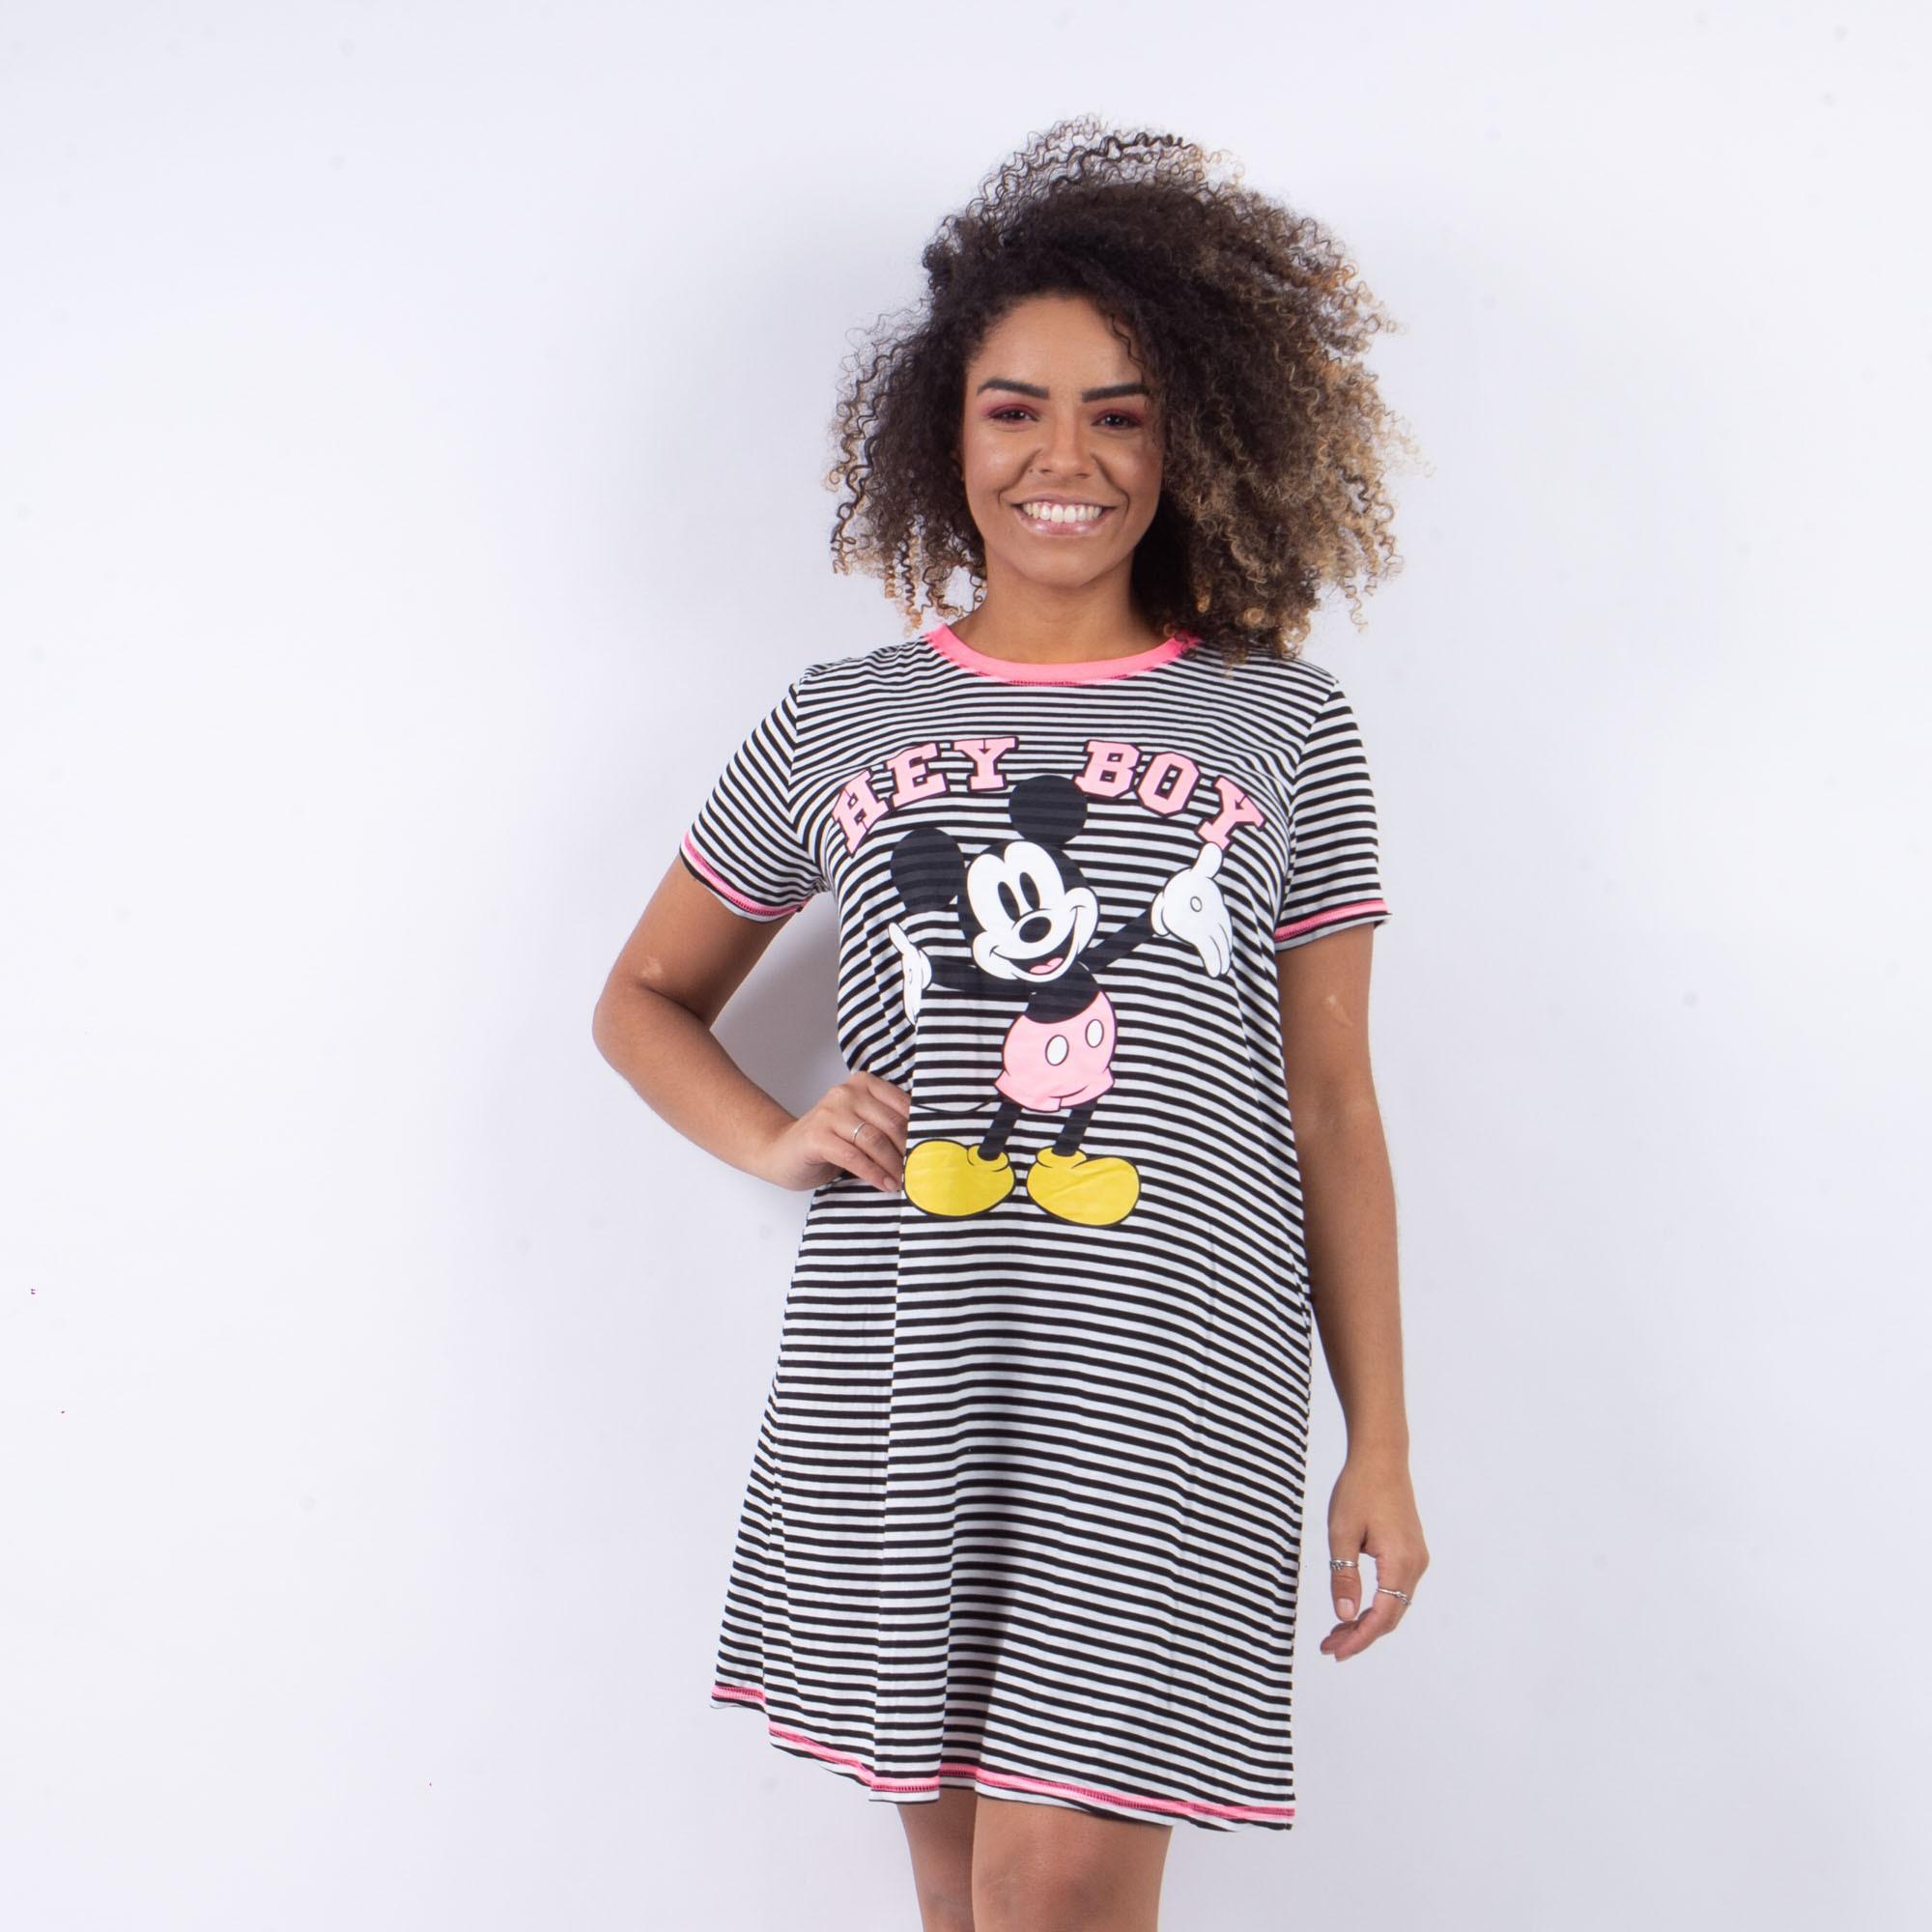 Camisola Manga Curta Feminina Preto E Rosa Listrado Estampa Mickey